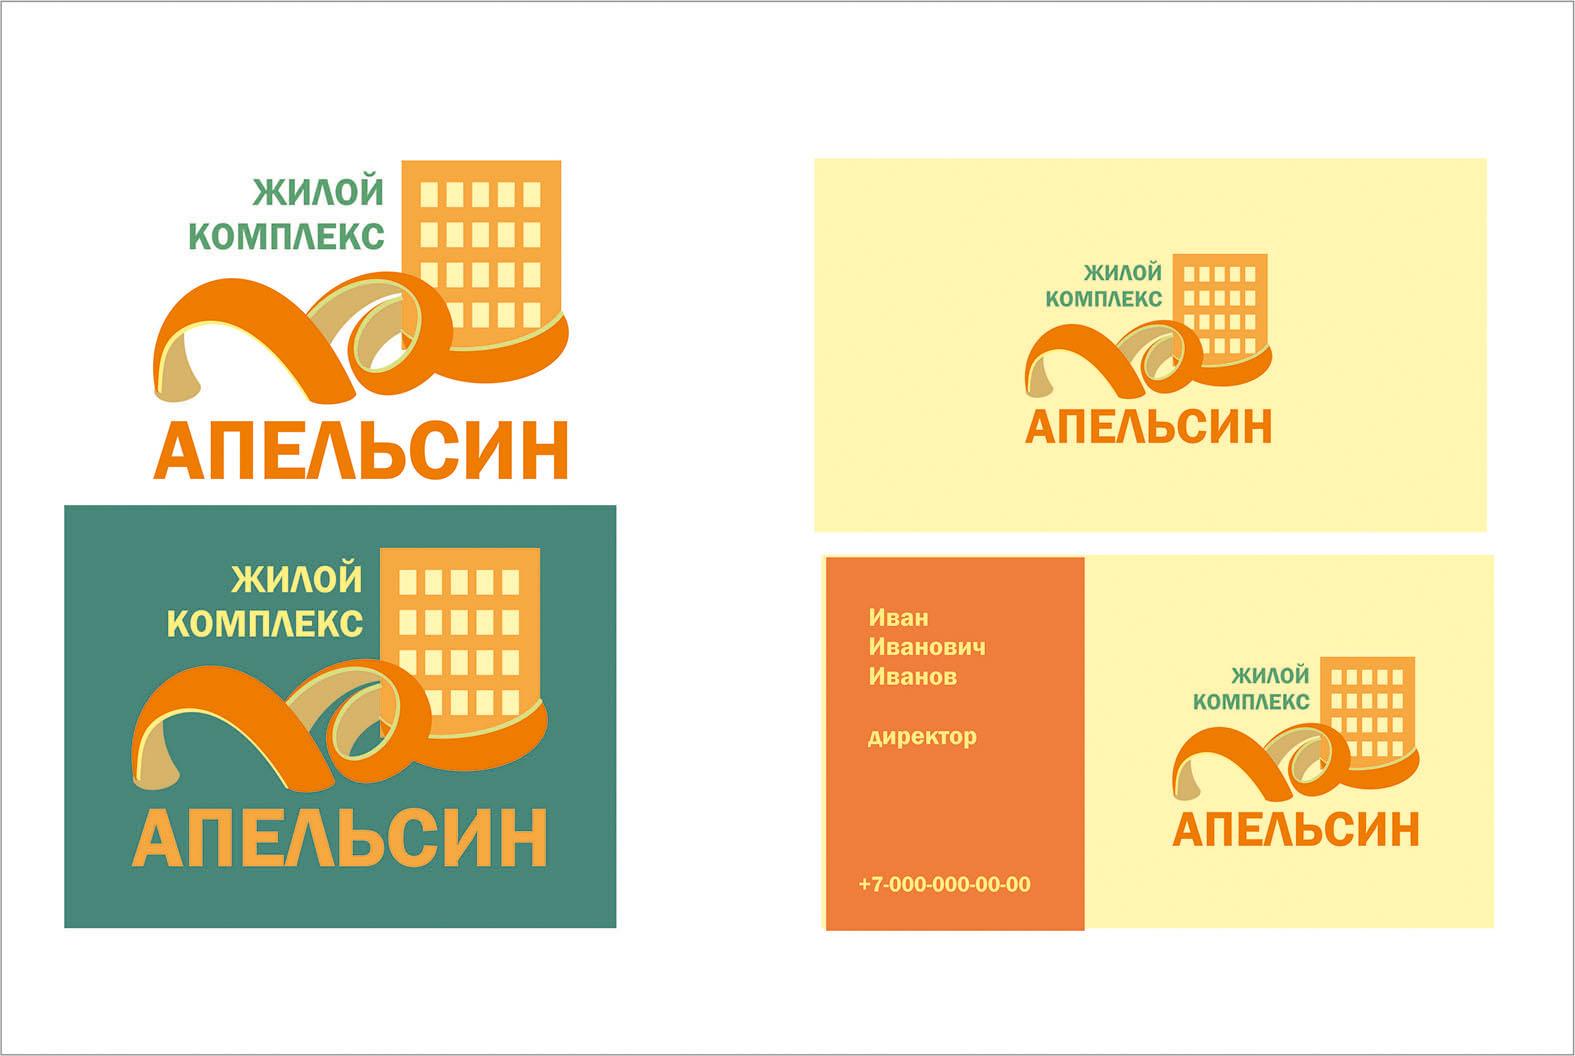 Логотип и фирменный стиль фото f_9635a6c941db4dcc.jpg